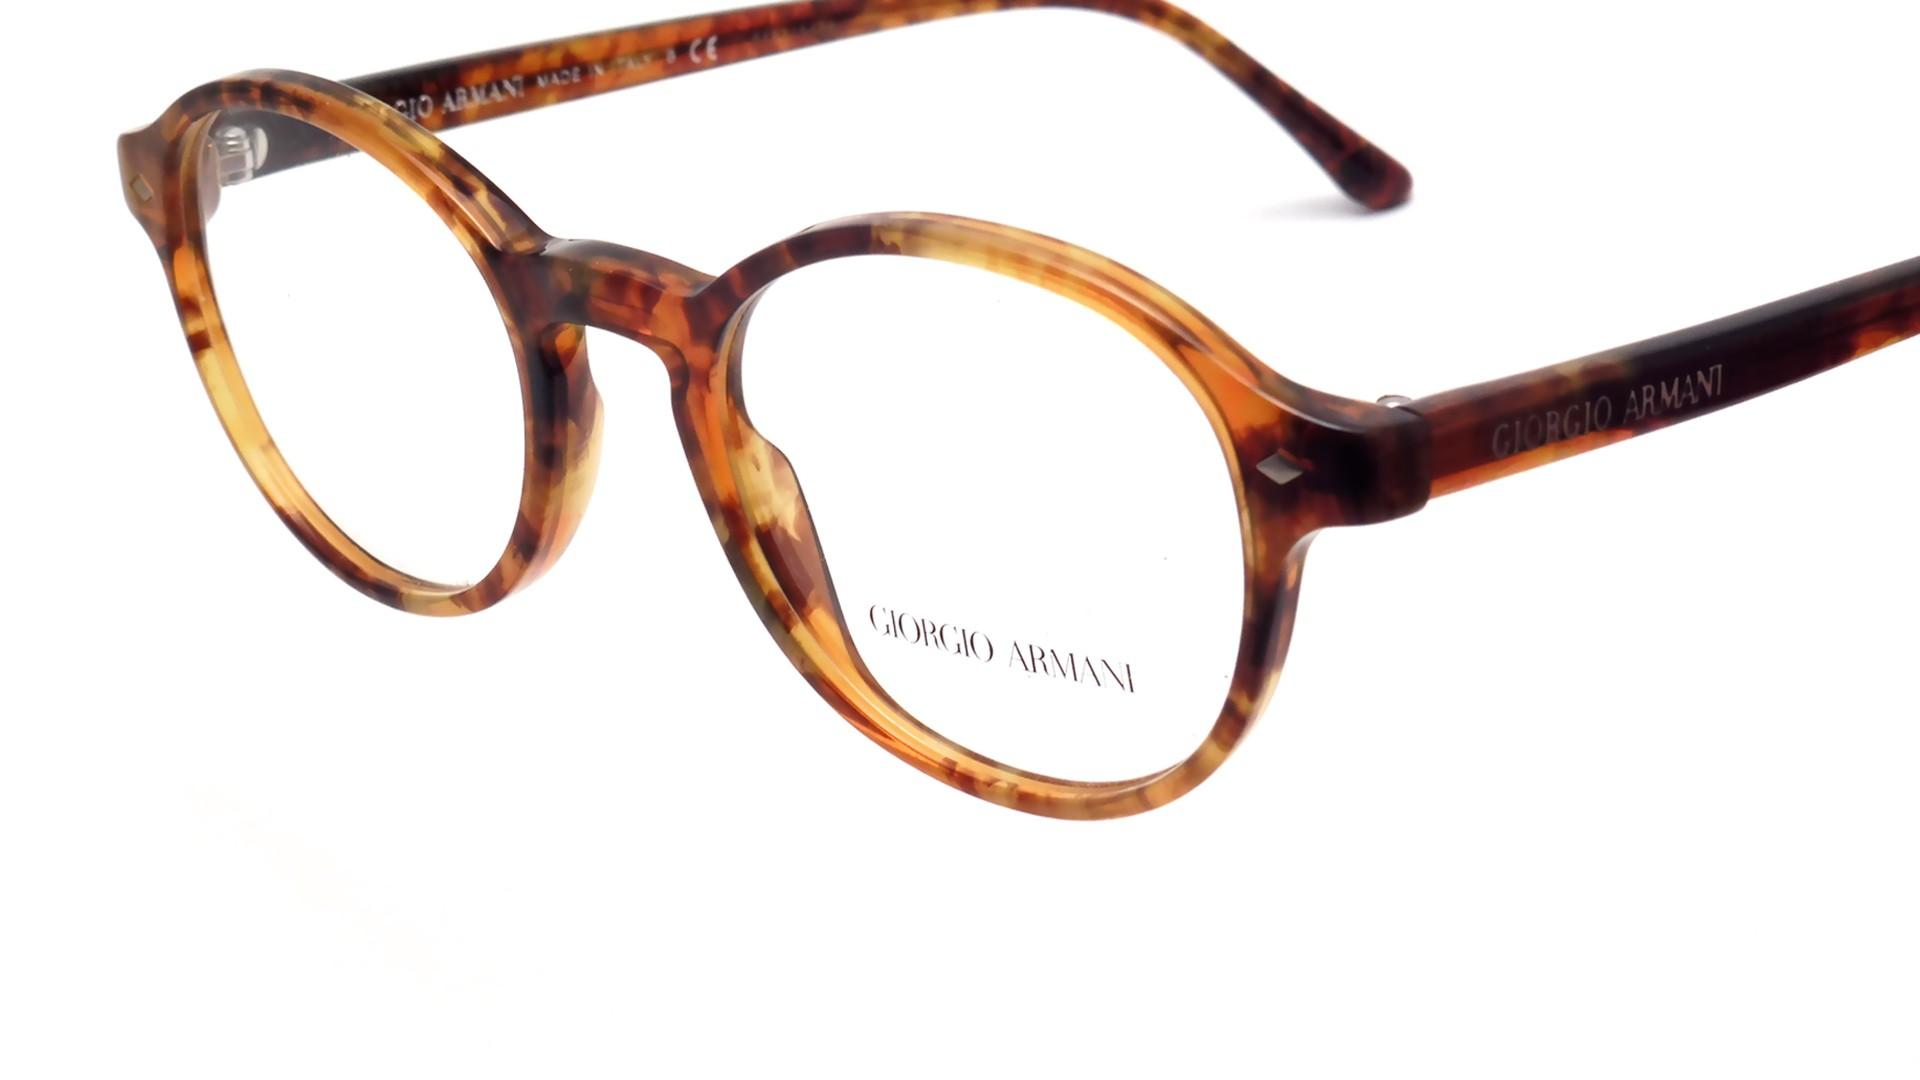 b14f16b601d7 Giorgio Armani Frames of Life Tortoise AR7004 5191 47-19